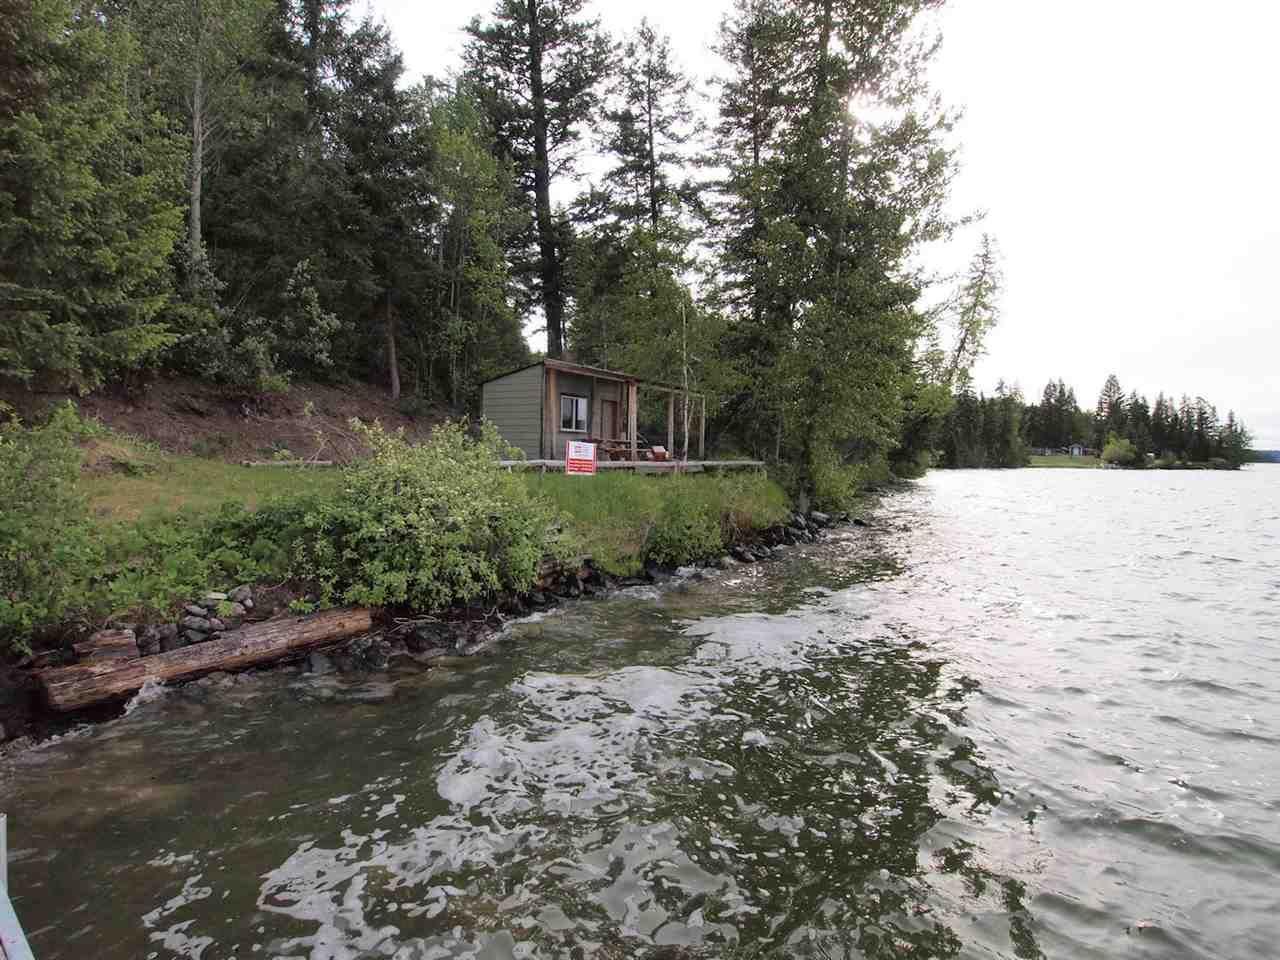 Main Photo: 4708 CAVERLY Road: Lac la Hache Land for sale (100 Mile House (Zone 10))  : MLS®# R2526879